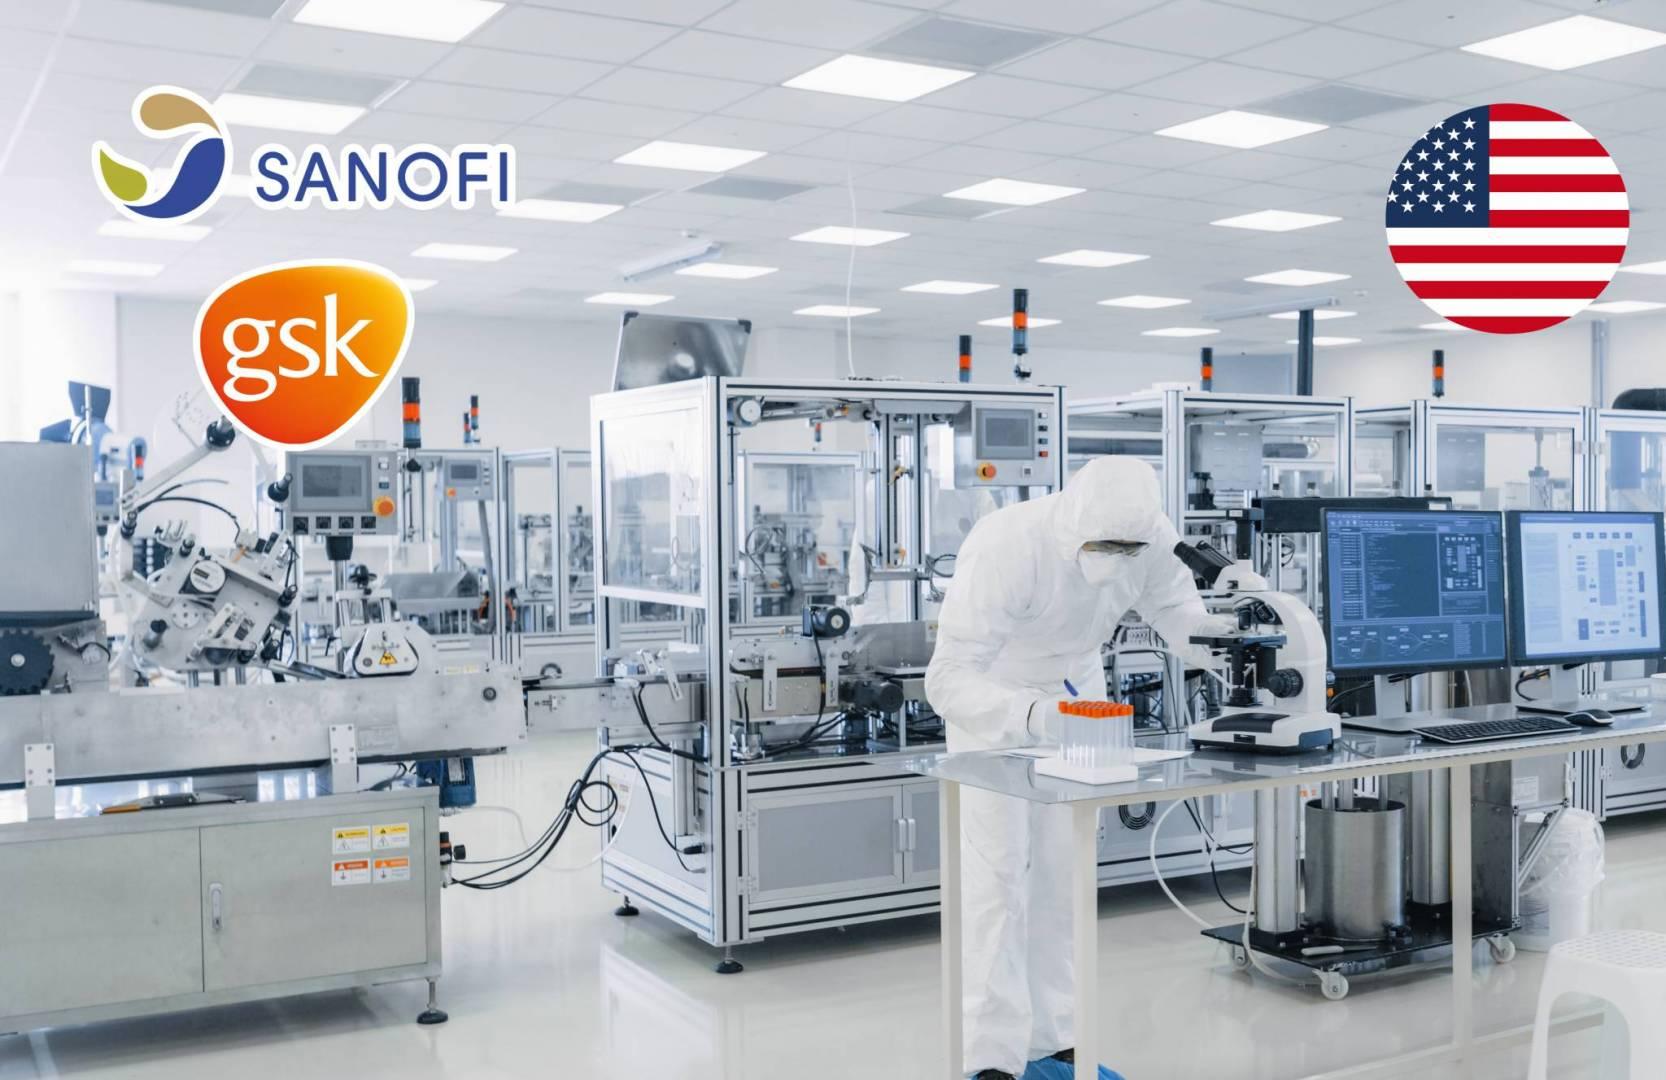 «Sanofi» و«GSK» ستحصلان على 2.1 مليار دولار من أميركا لدعم تطوير لقاح «كورونا»